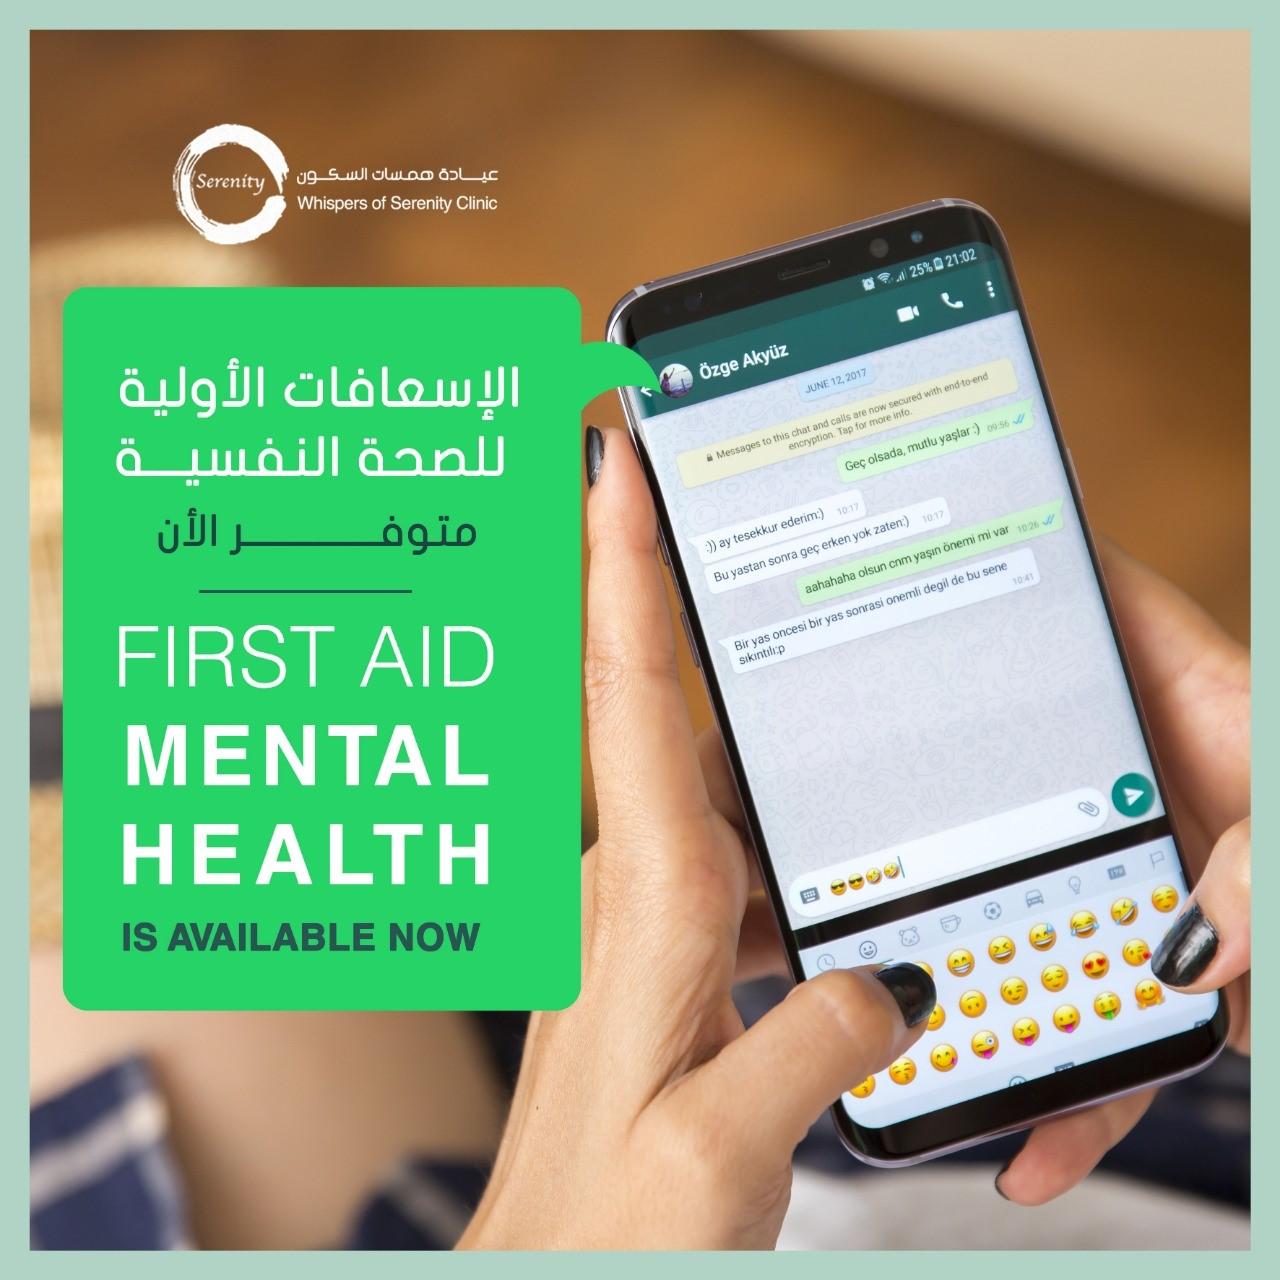 H.H Basma Al Said aims to spread Mental Health Awareness through the 'Not Alone' Mental Health Campaign